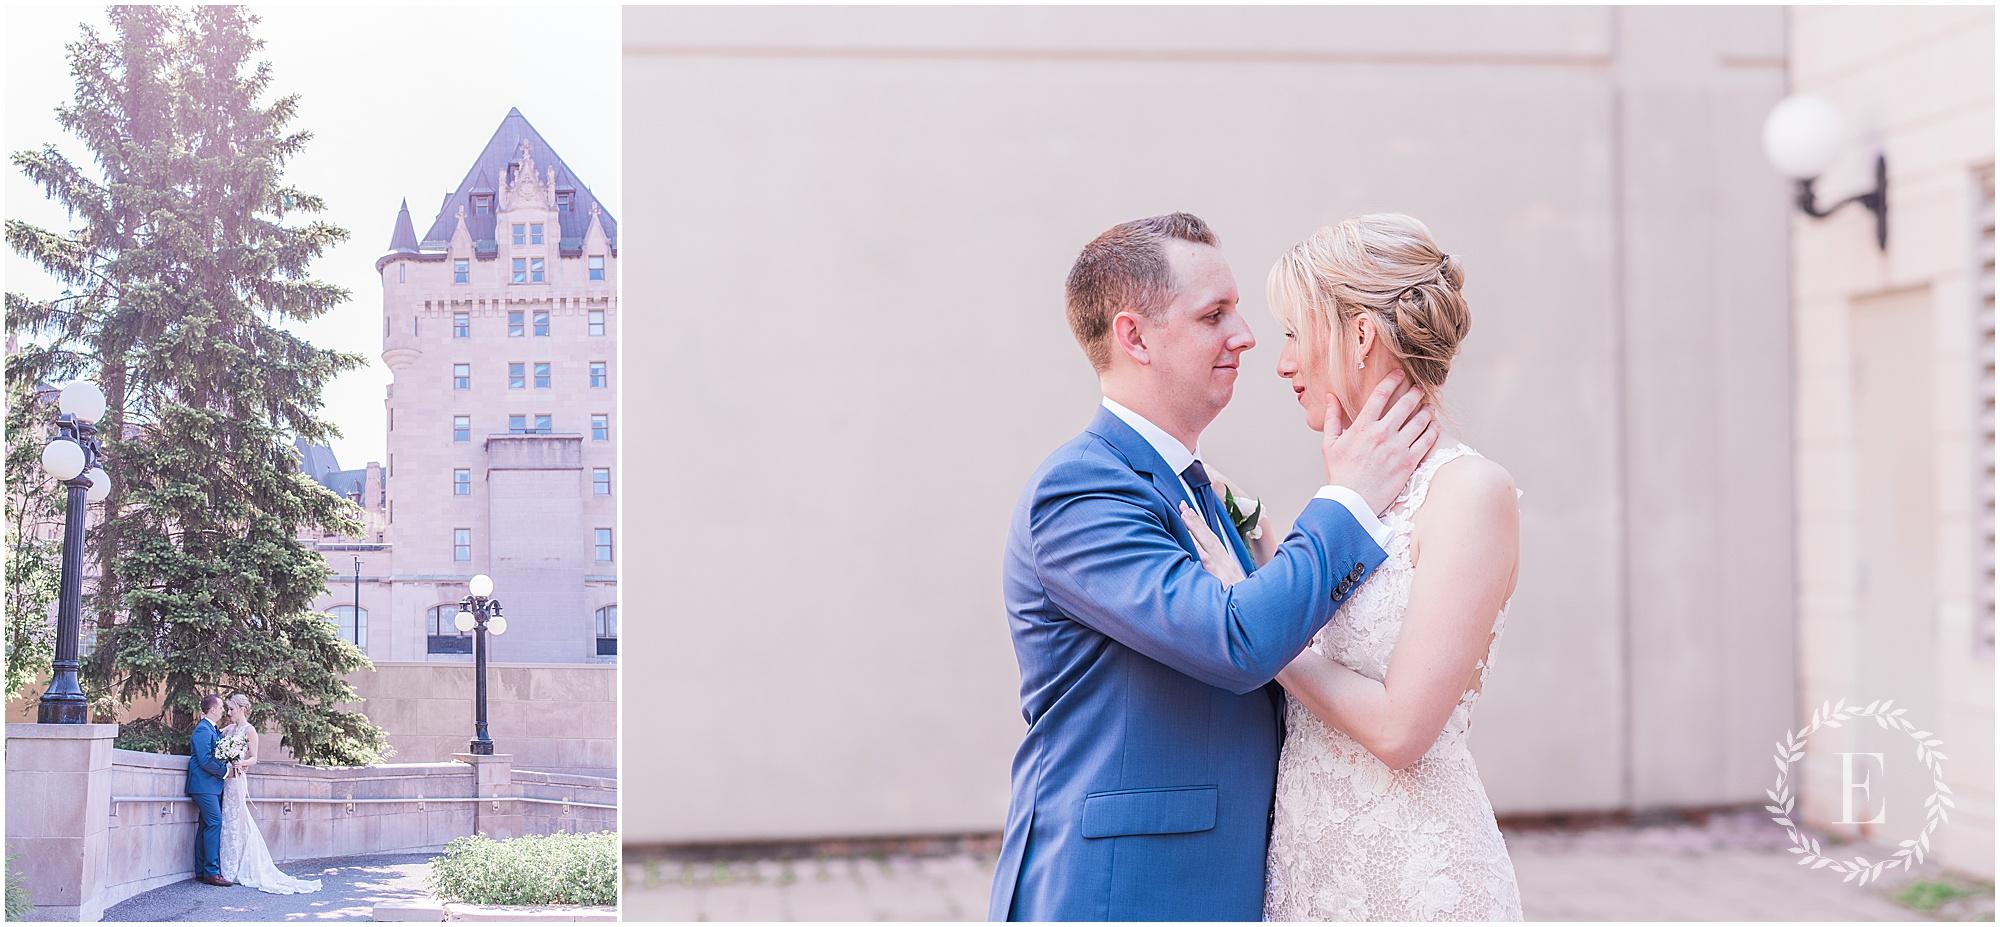 0028 K and J - Restaurant 18 Brunch Wedding Ottawa- Photography by Emma.jpg